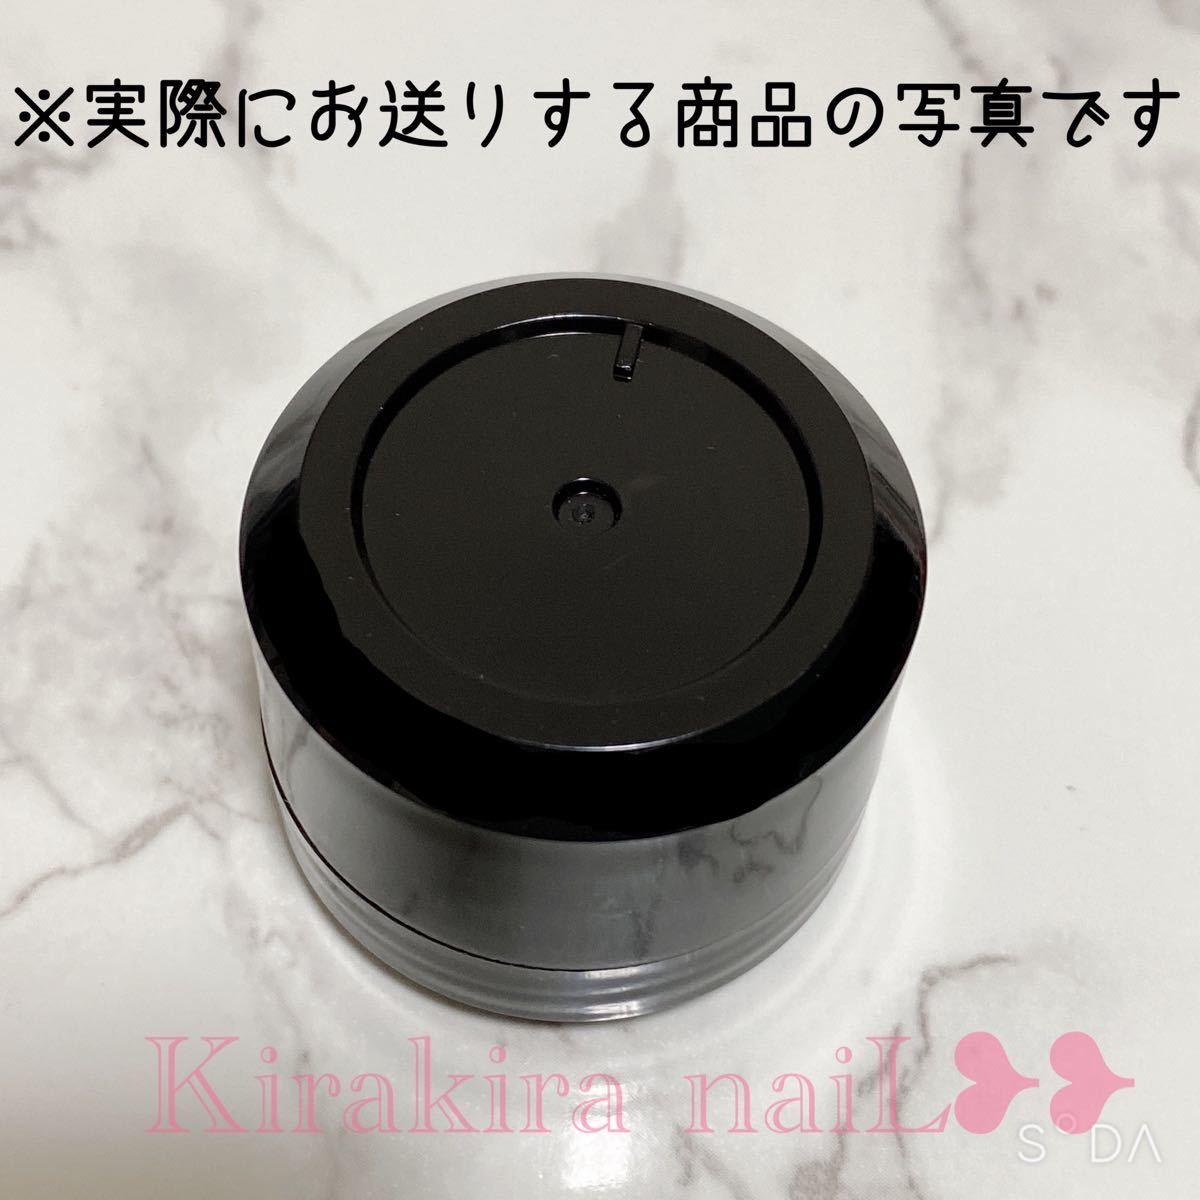 New★全12種☆Venalisa☆グリッタージェル☆カラーラメジェル P52